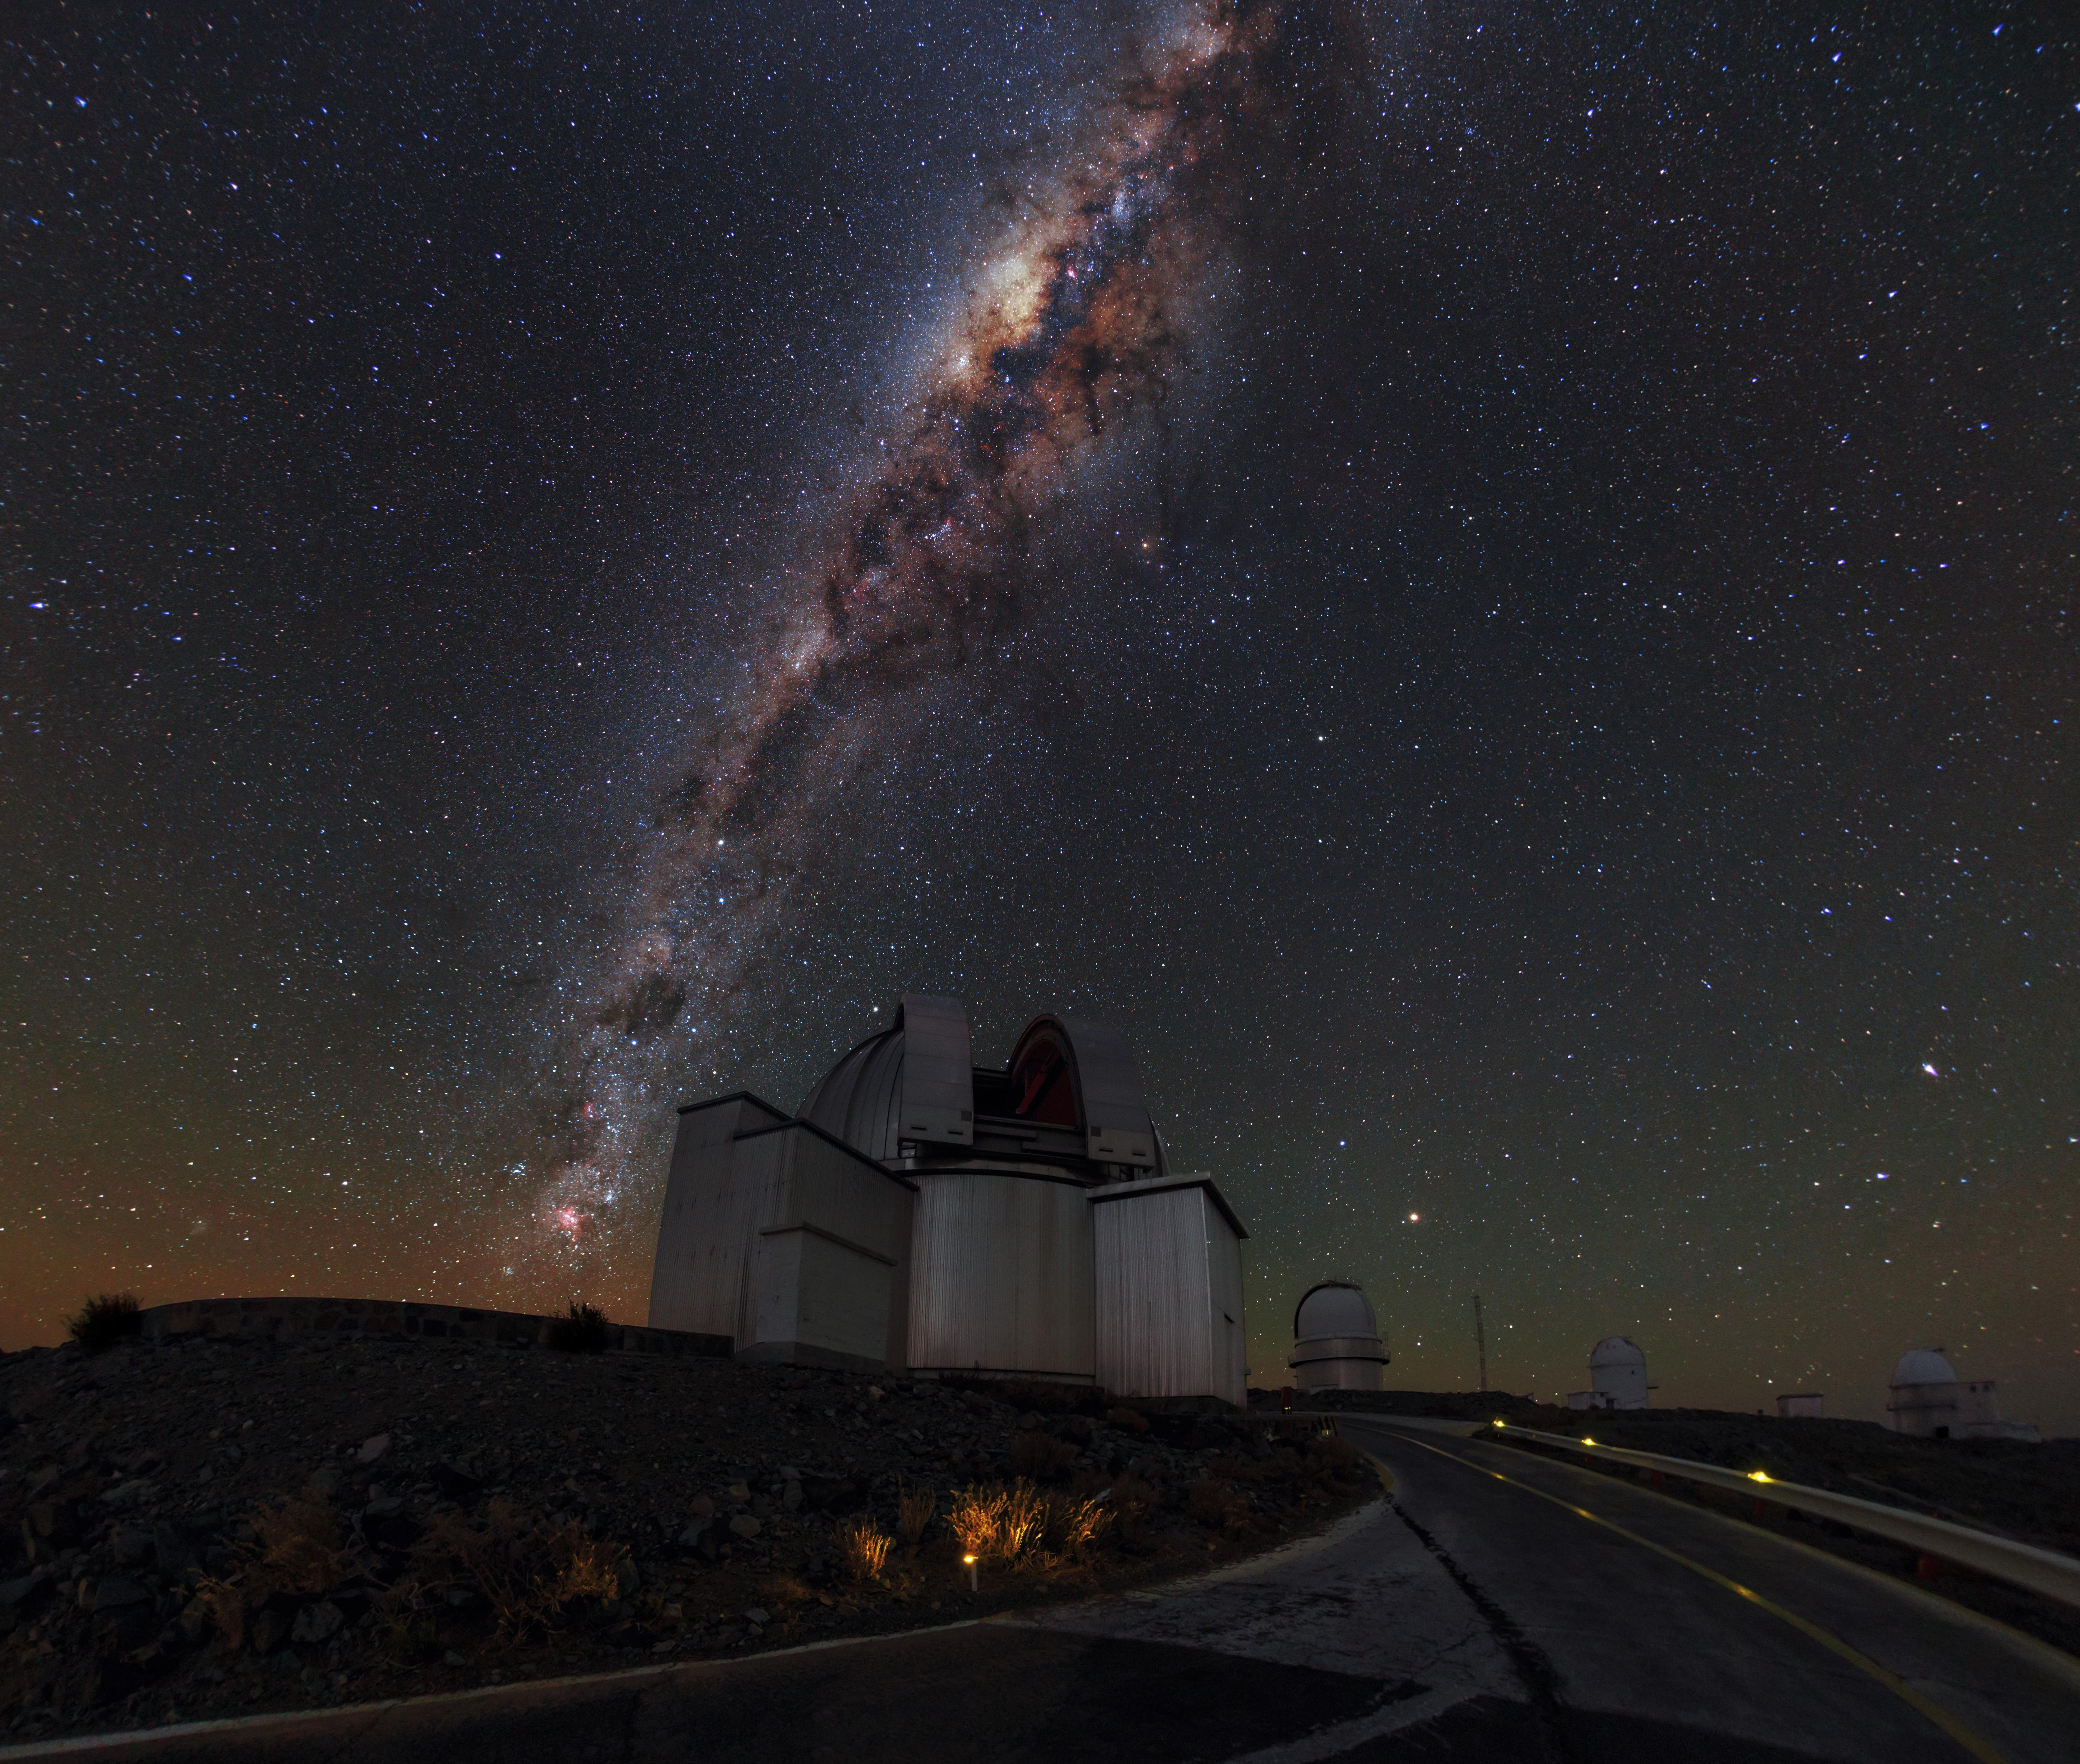 Ảnh chụp tại sa mạc Atacama, Chile.